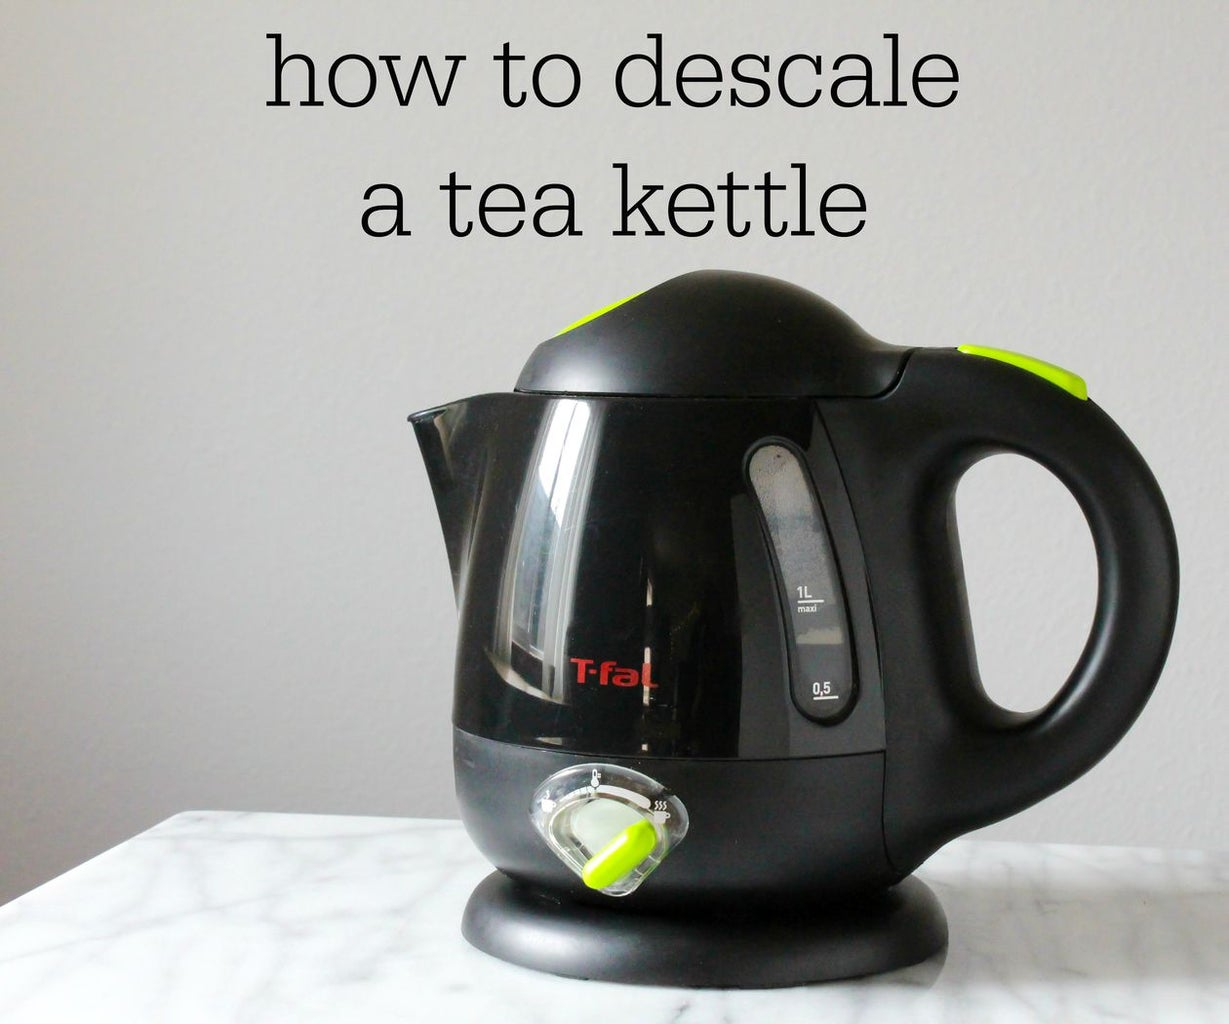 How to Descale a Tea Kettle